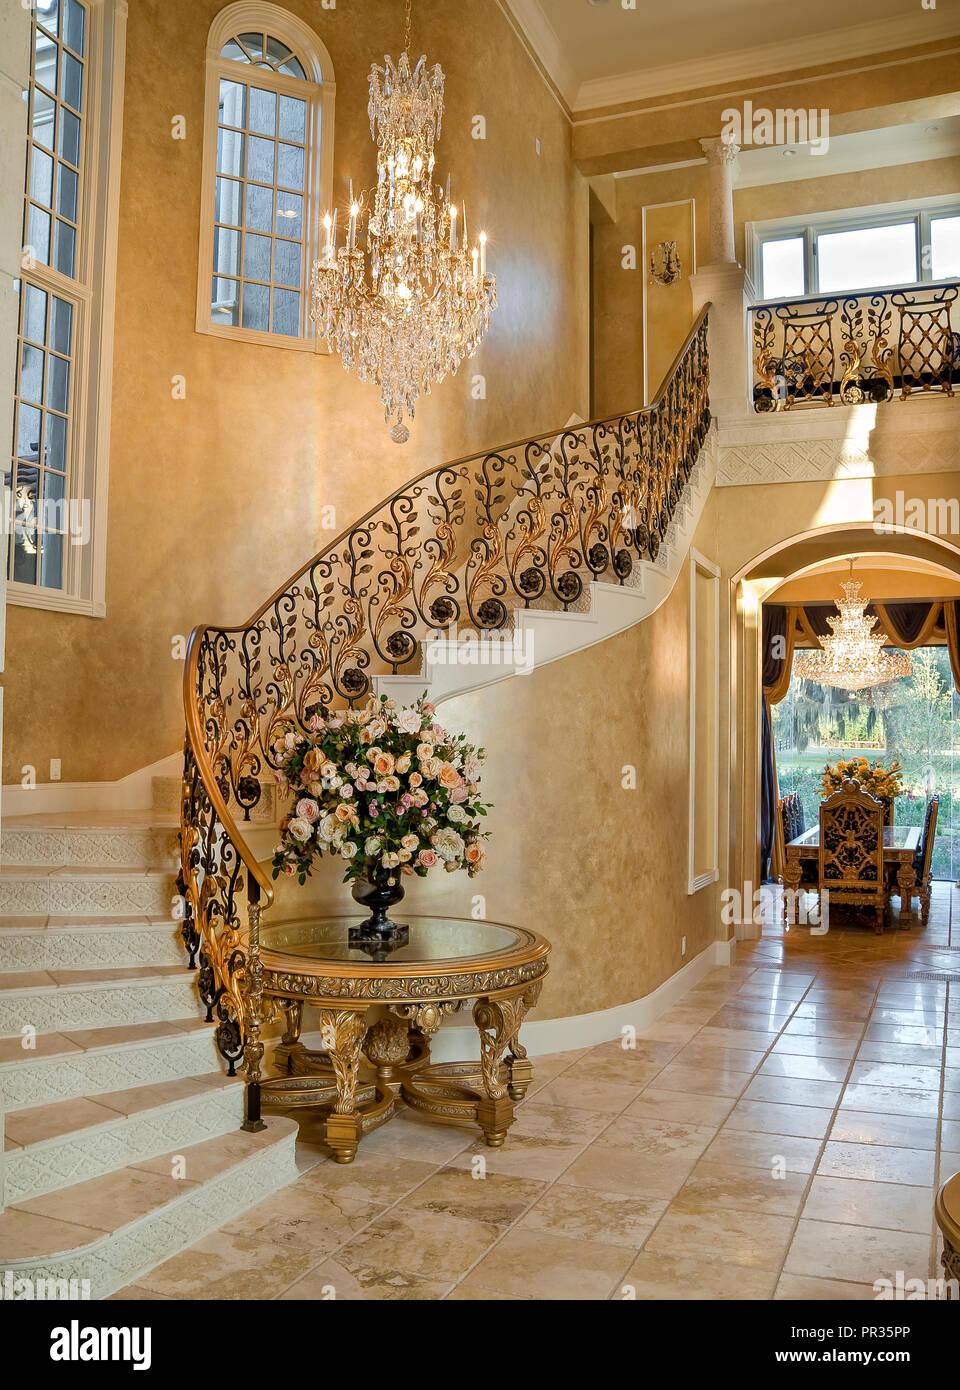 Decorative upscale winding forged aluminum staircase balustrade - Stock Image